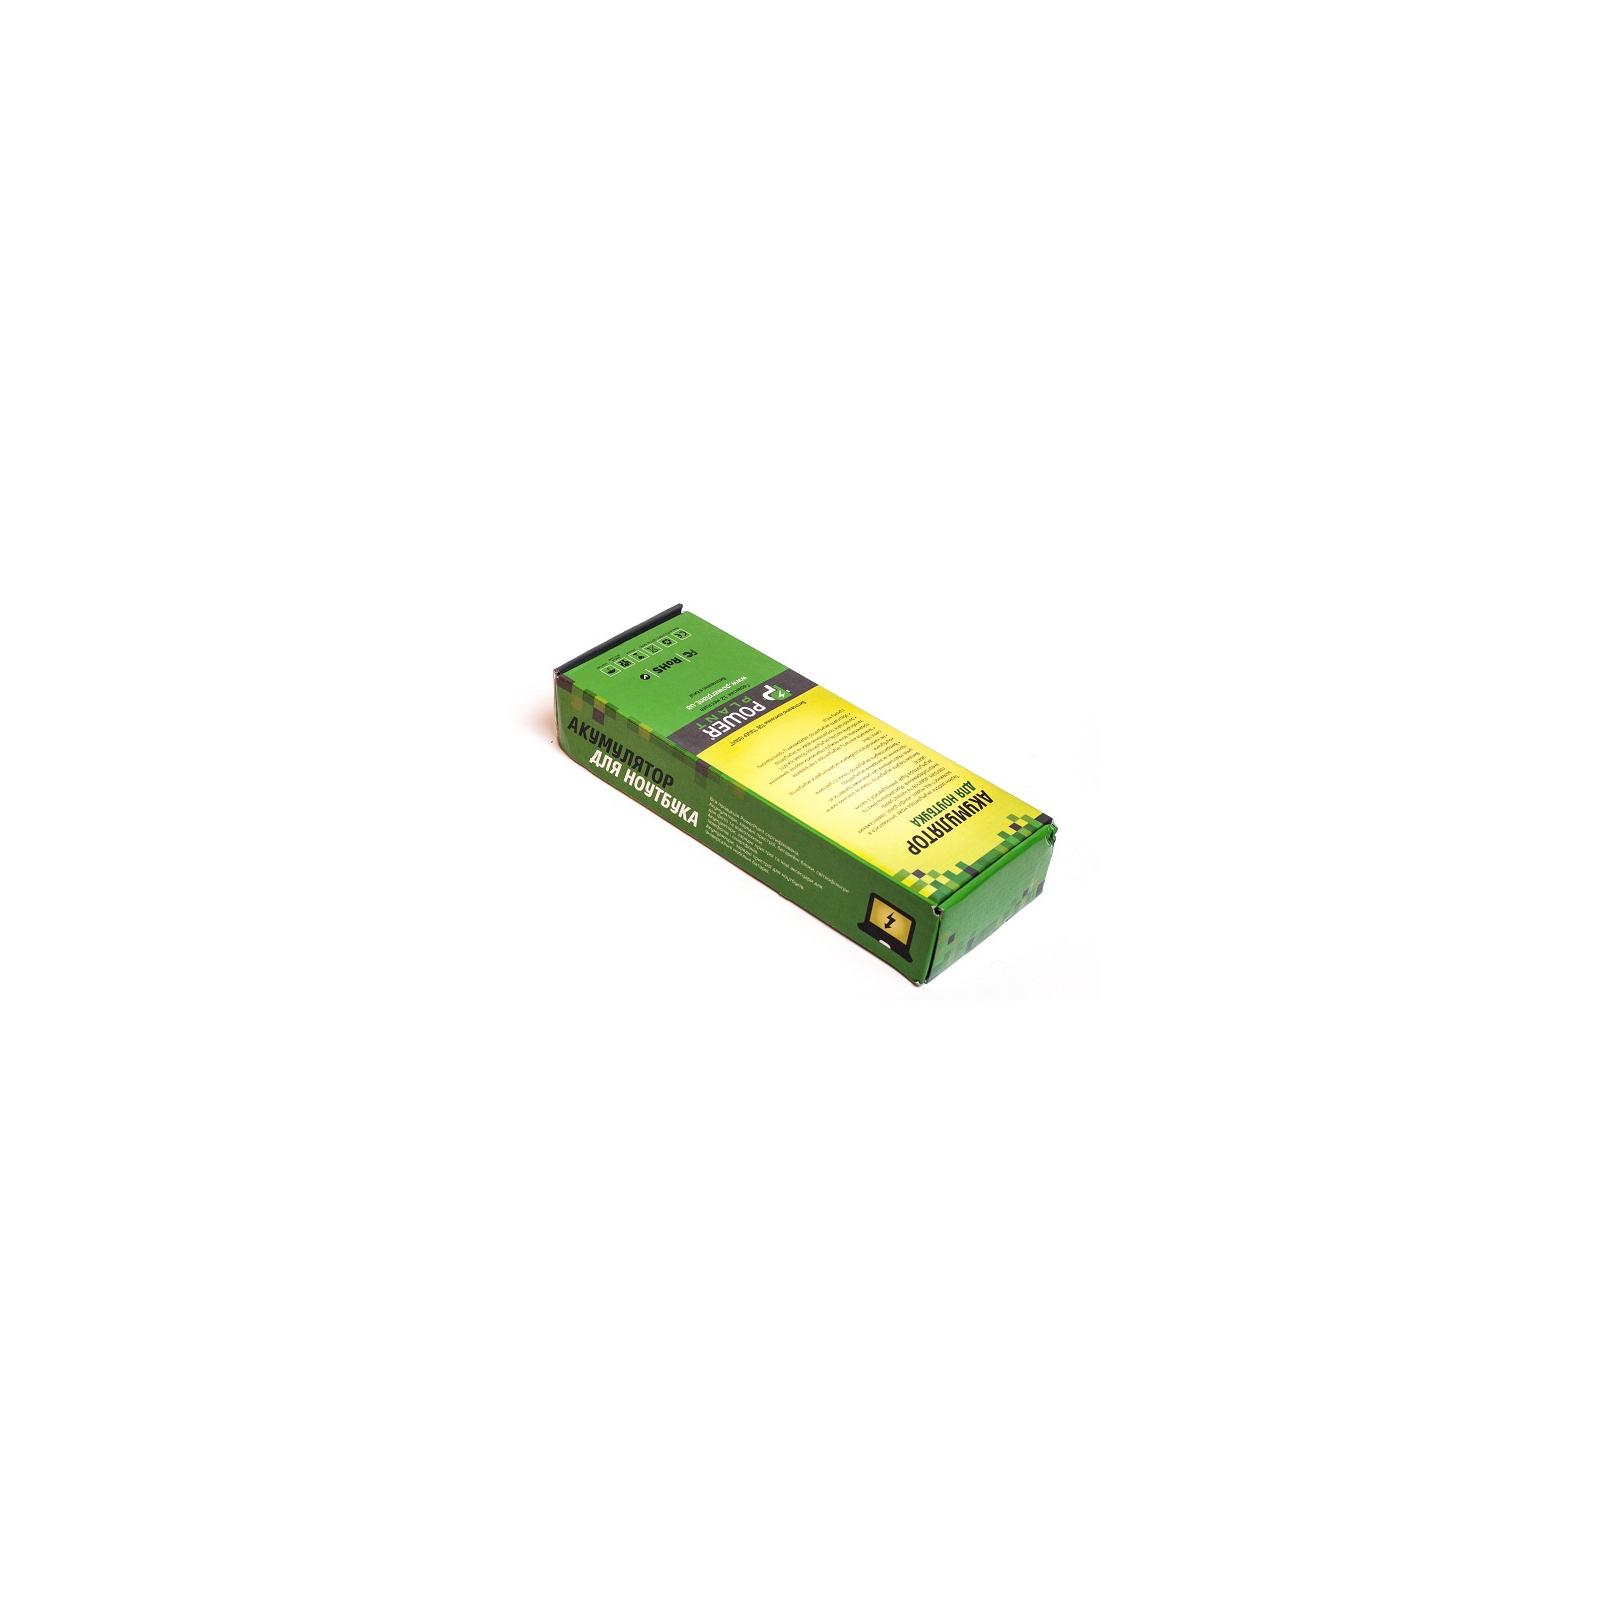 Аккумулятор для ноутбука DELL Latitude E6400 (NM633, DE E6400 3SP2) 11.1V 5200mAh PowerPlant (NB00000111) изображение 2